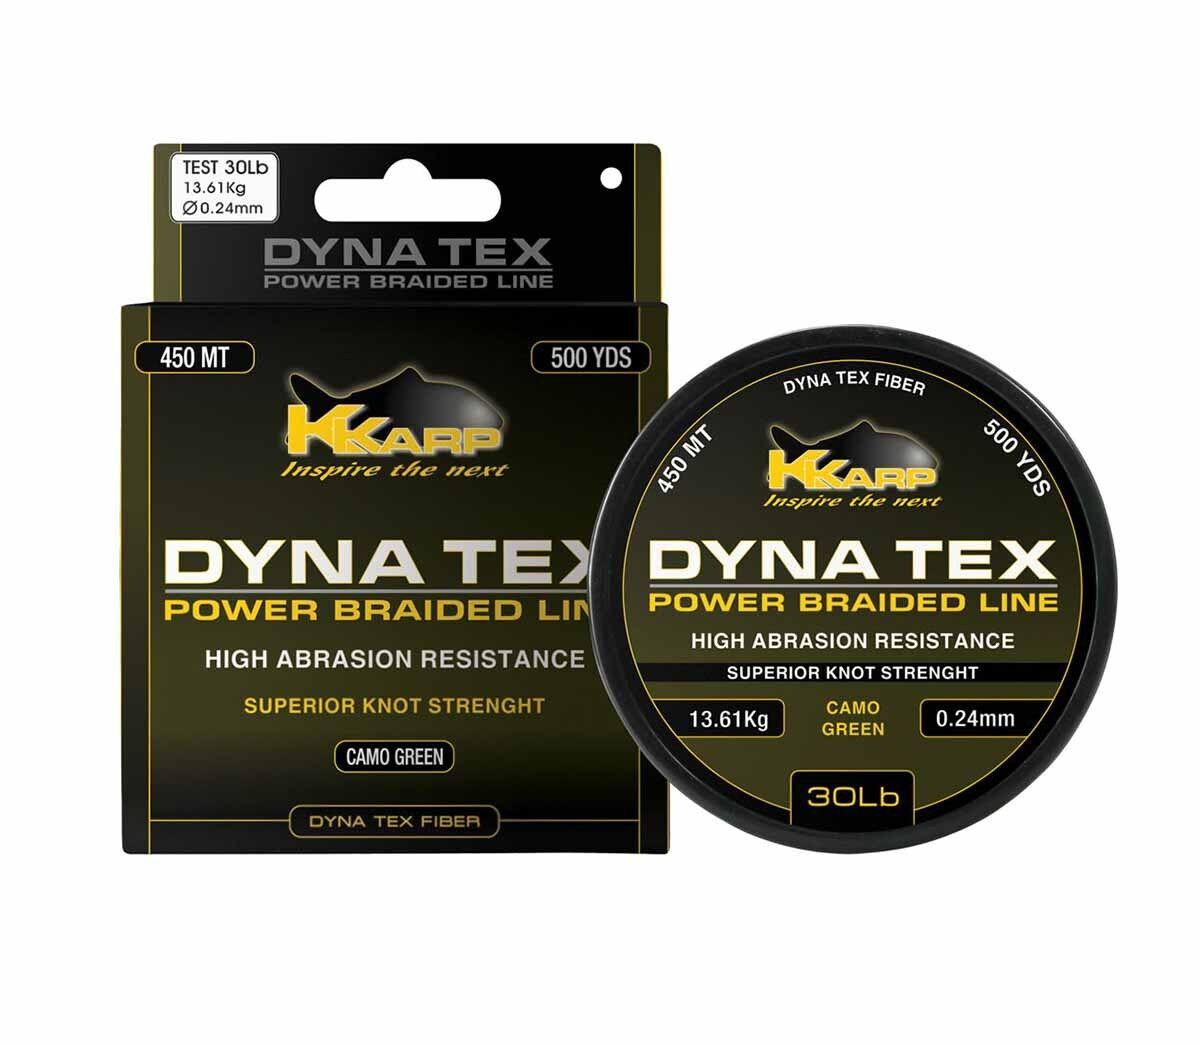 Monofilo Trecciato K-Karp Dyna-Tex energia Braid Pesca autopfishing lungo Range RN